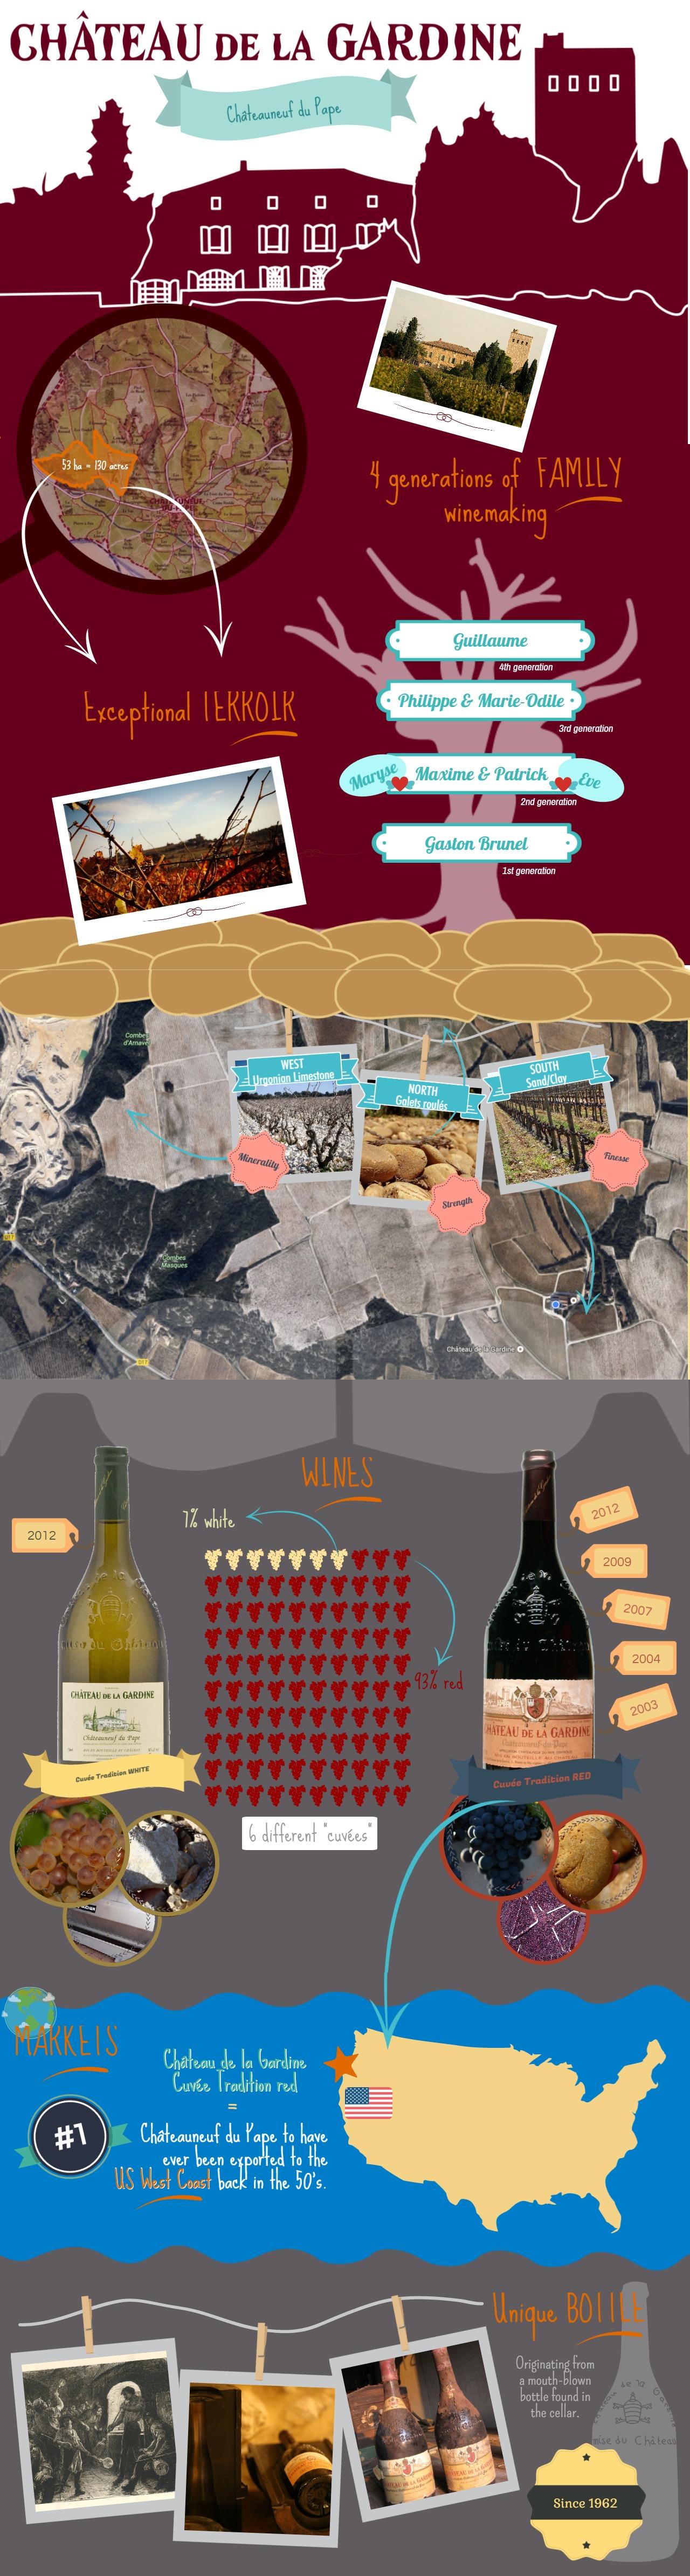 Infographics: Château de la Gardine in 20 seconds